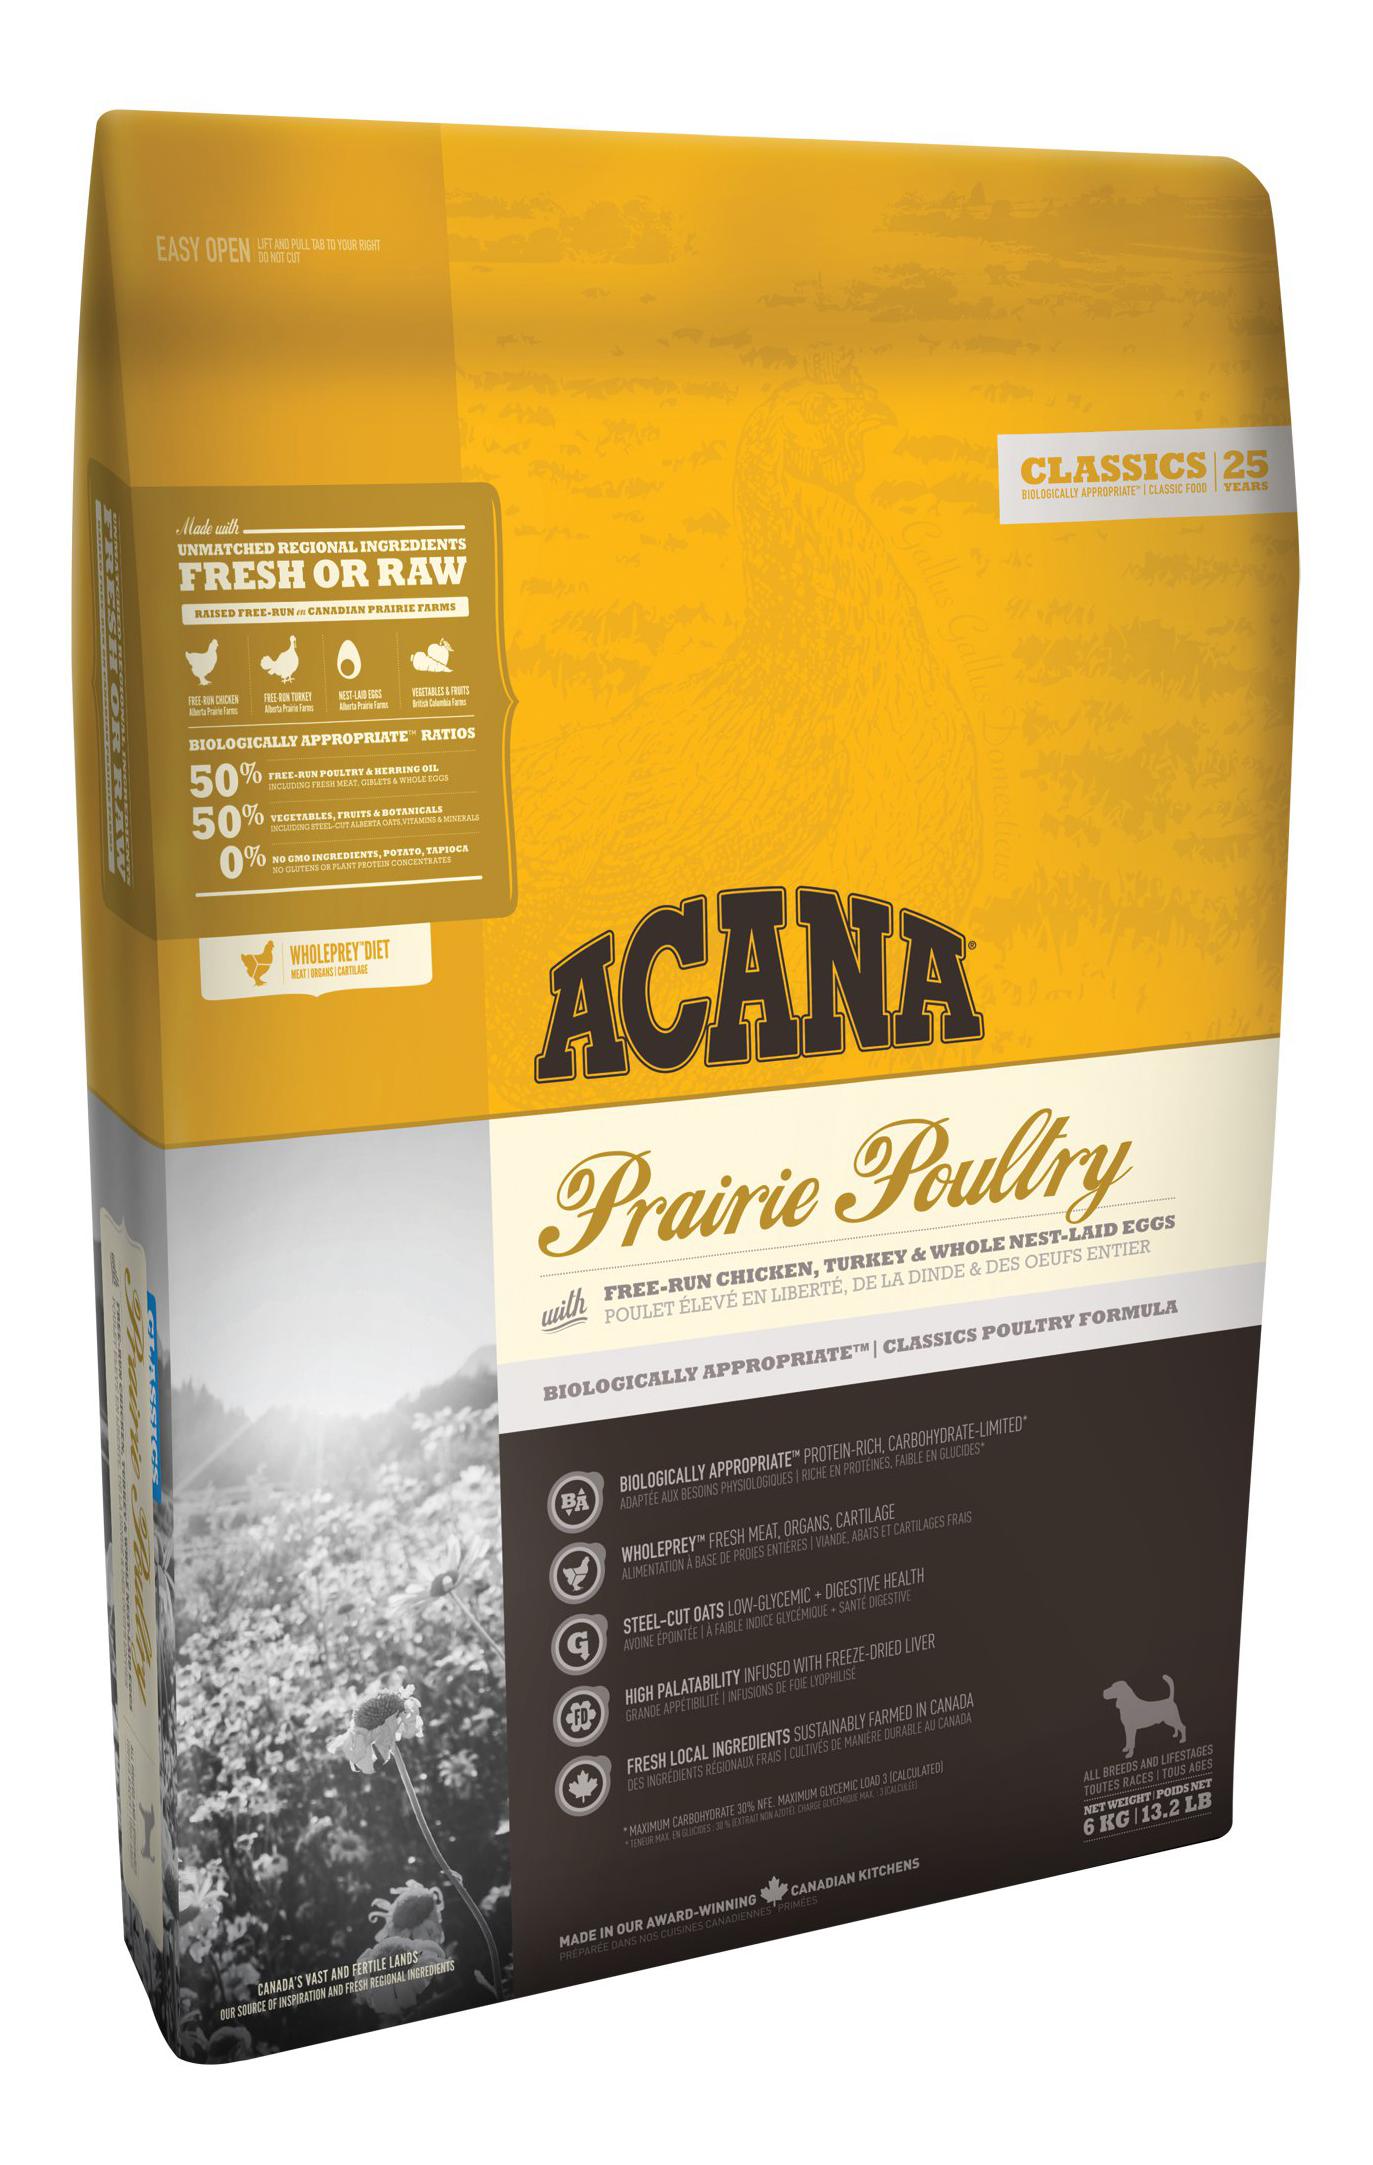 Сухой корм для собак ACANA Classics Prairie Poultry, индейка, курица, овес, 6кг фото